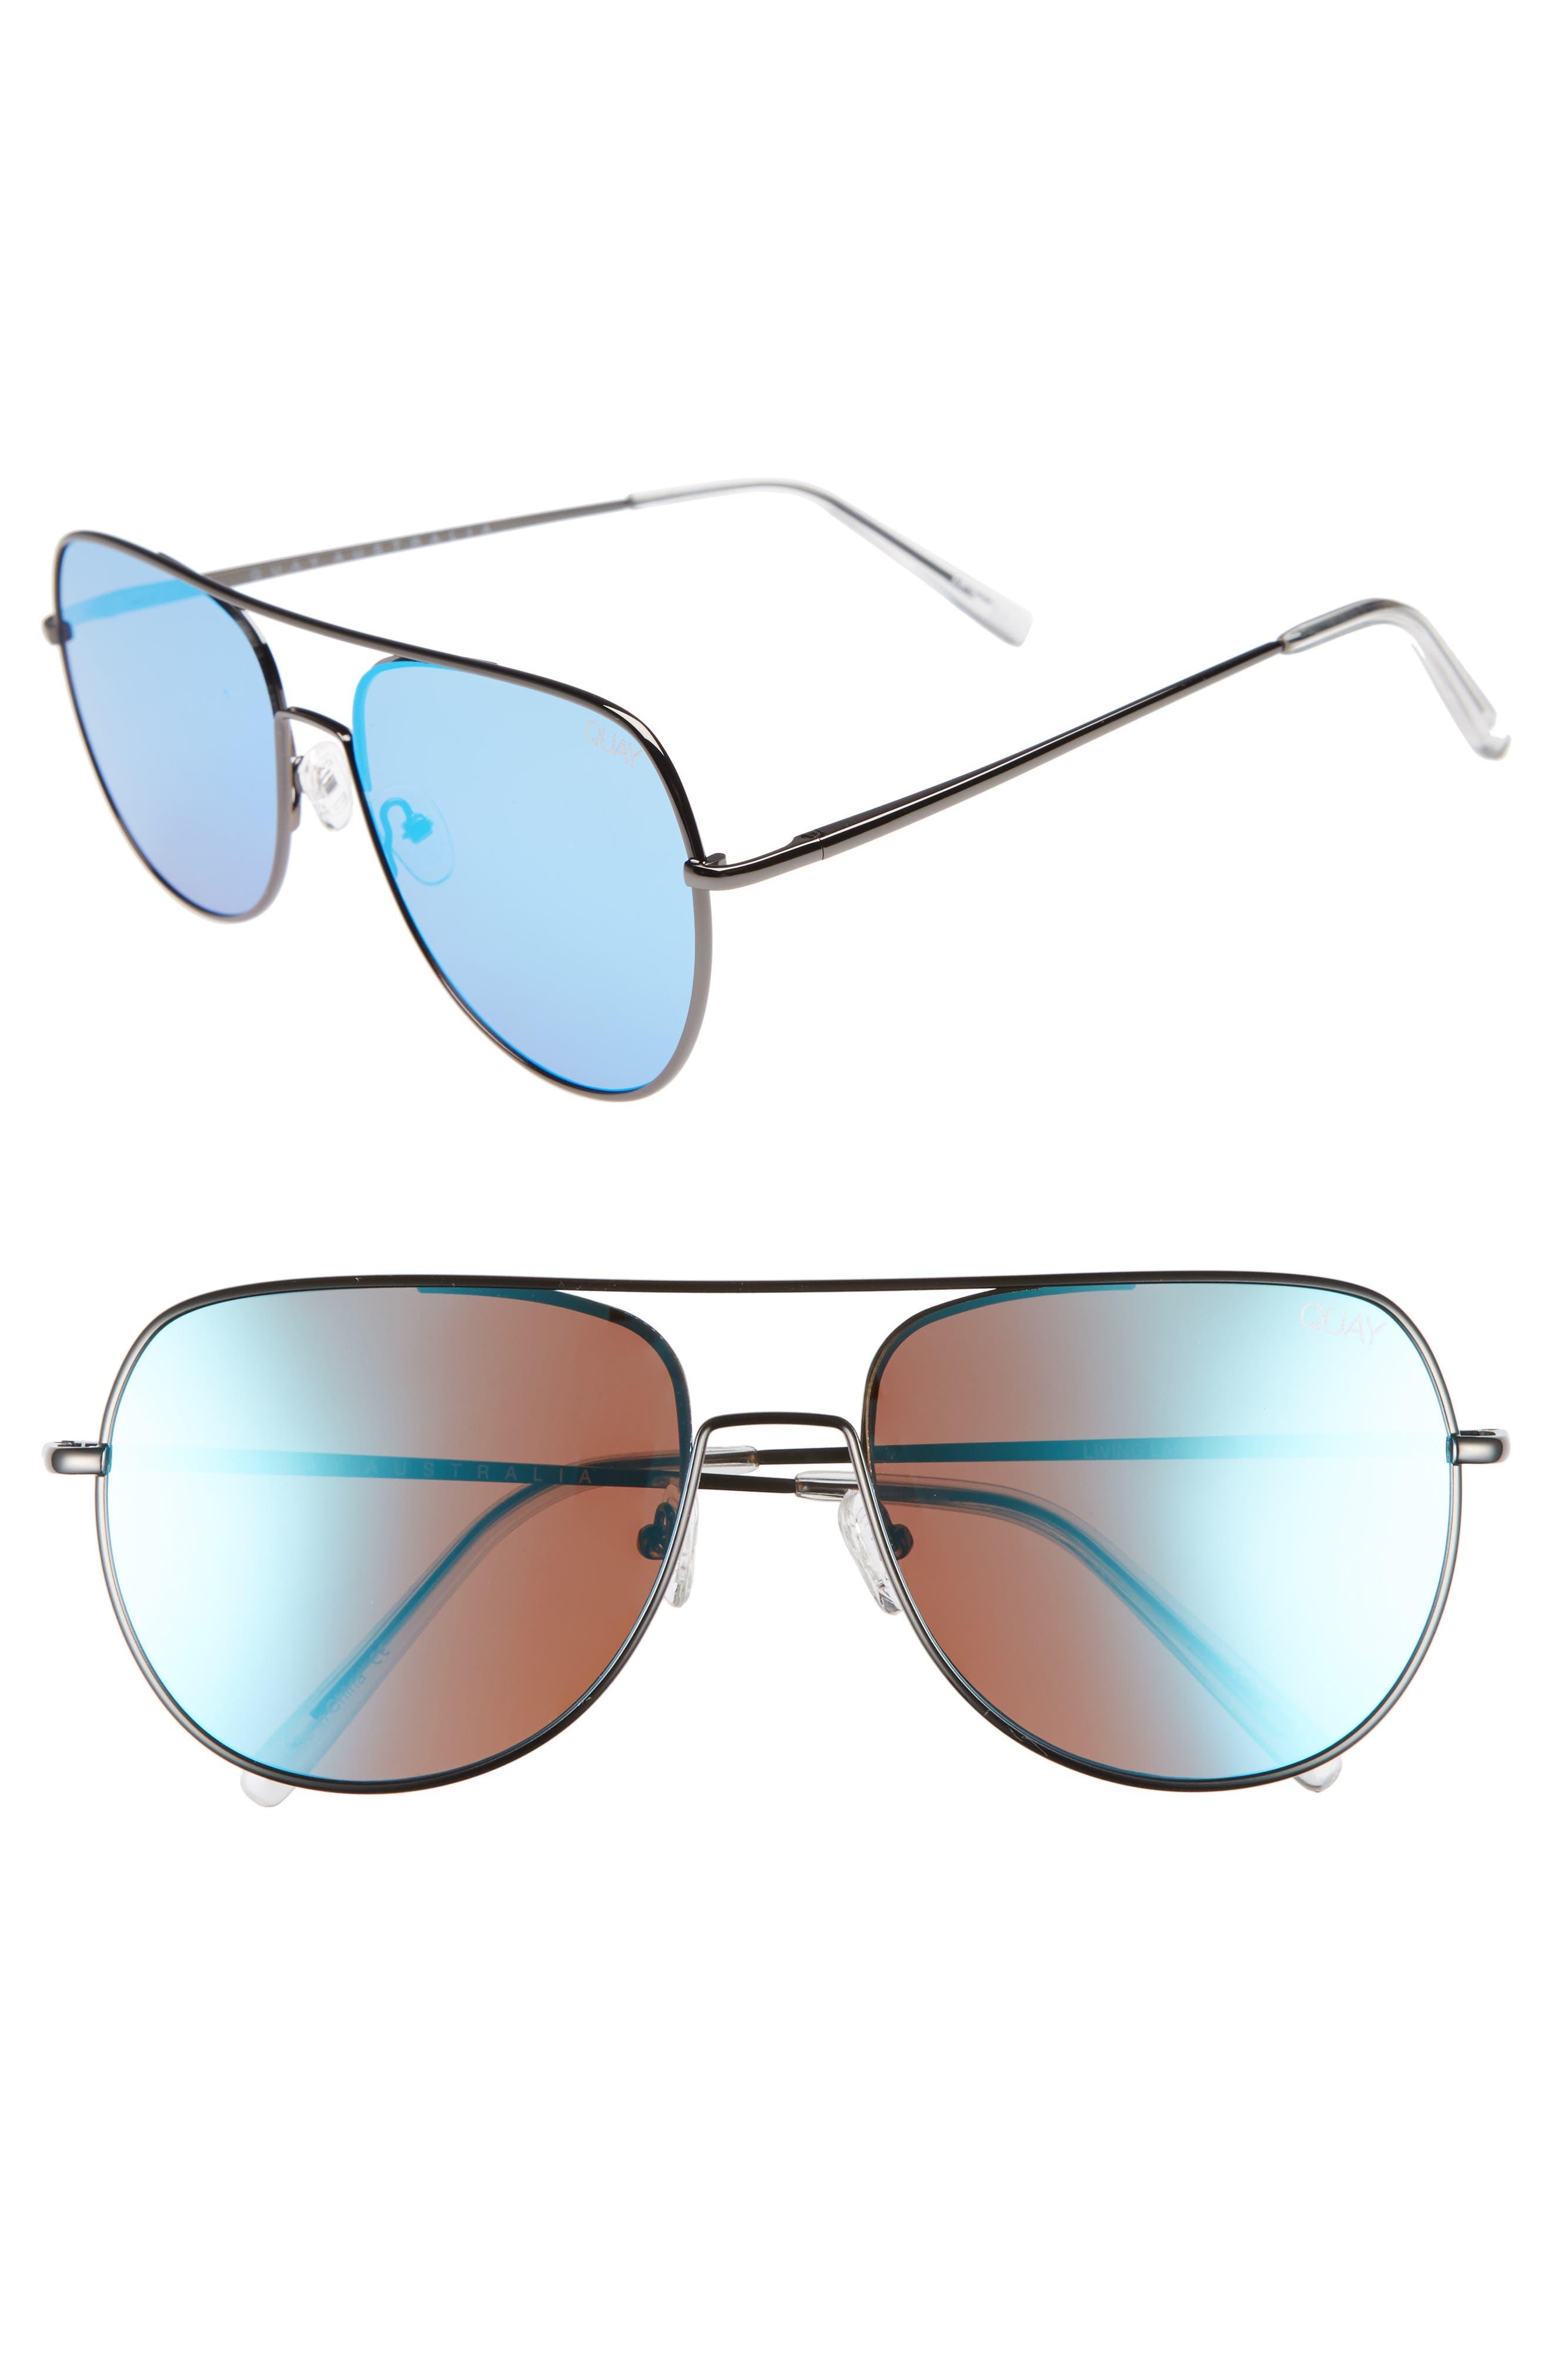 Quay Australia Living Large 5m Aviator Sunglasses - Dark Grey/blue